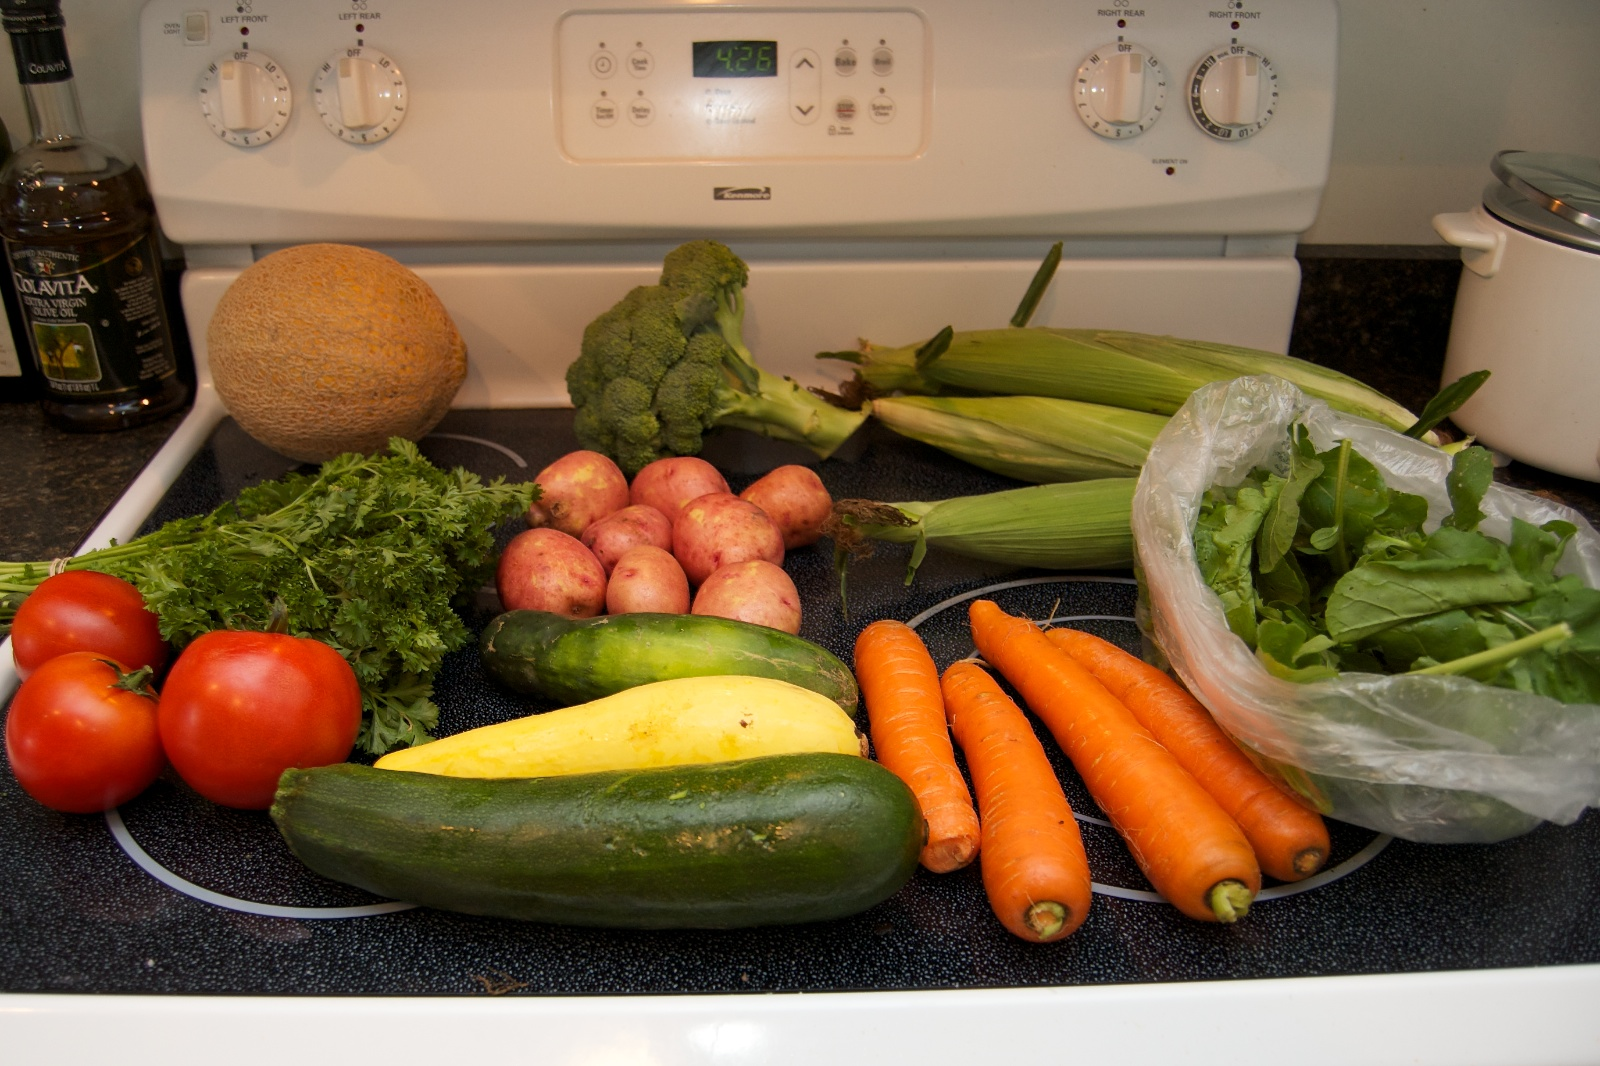 http://blog.rickk.com/food/2010/08/12/csa9-1.jpg